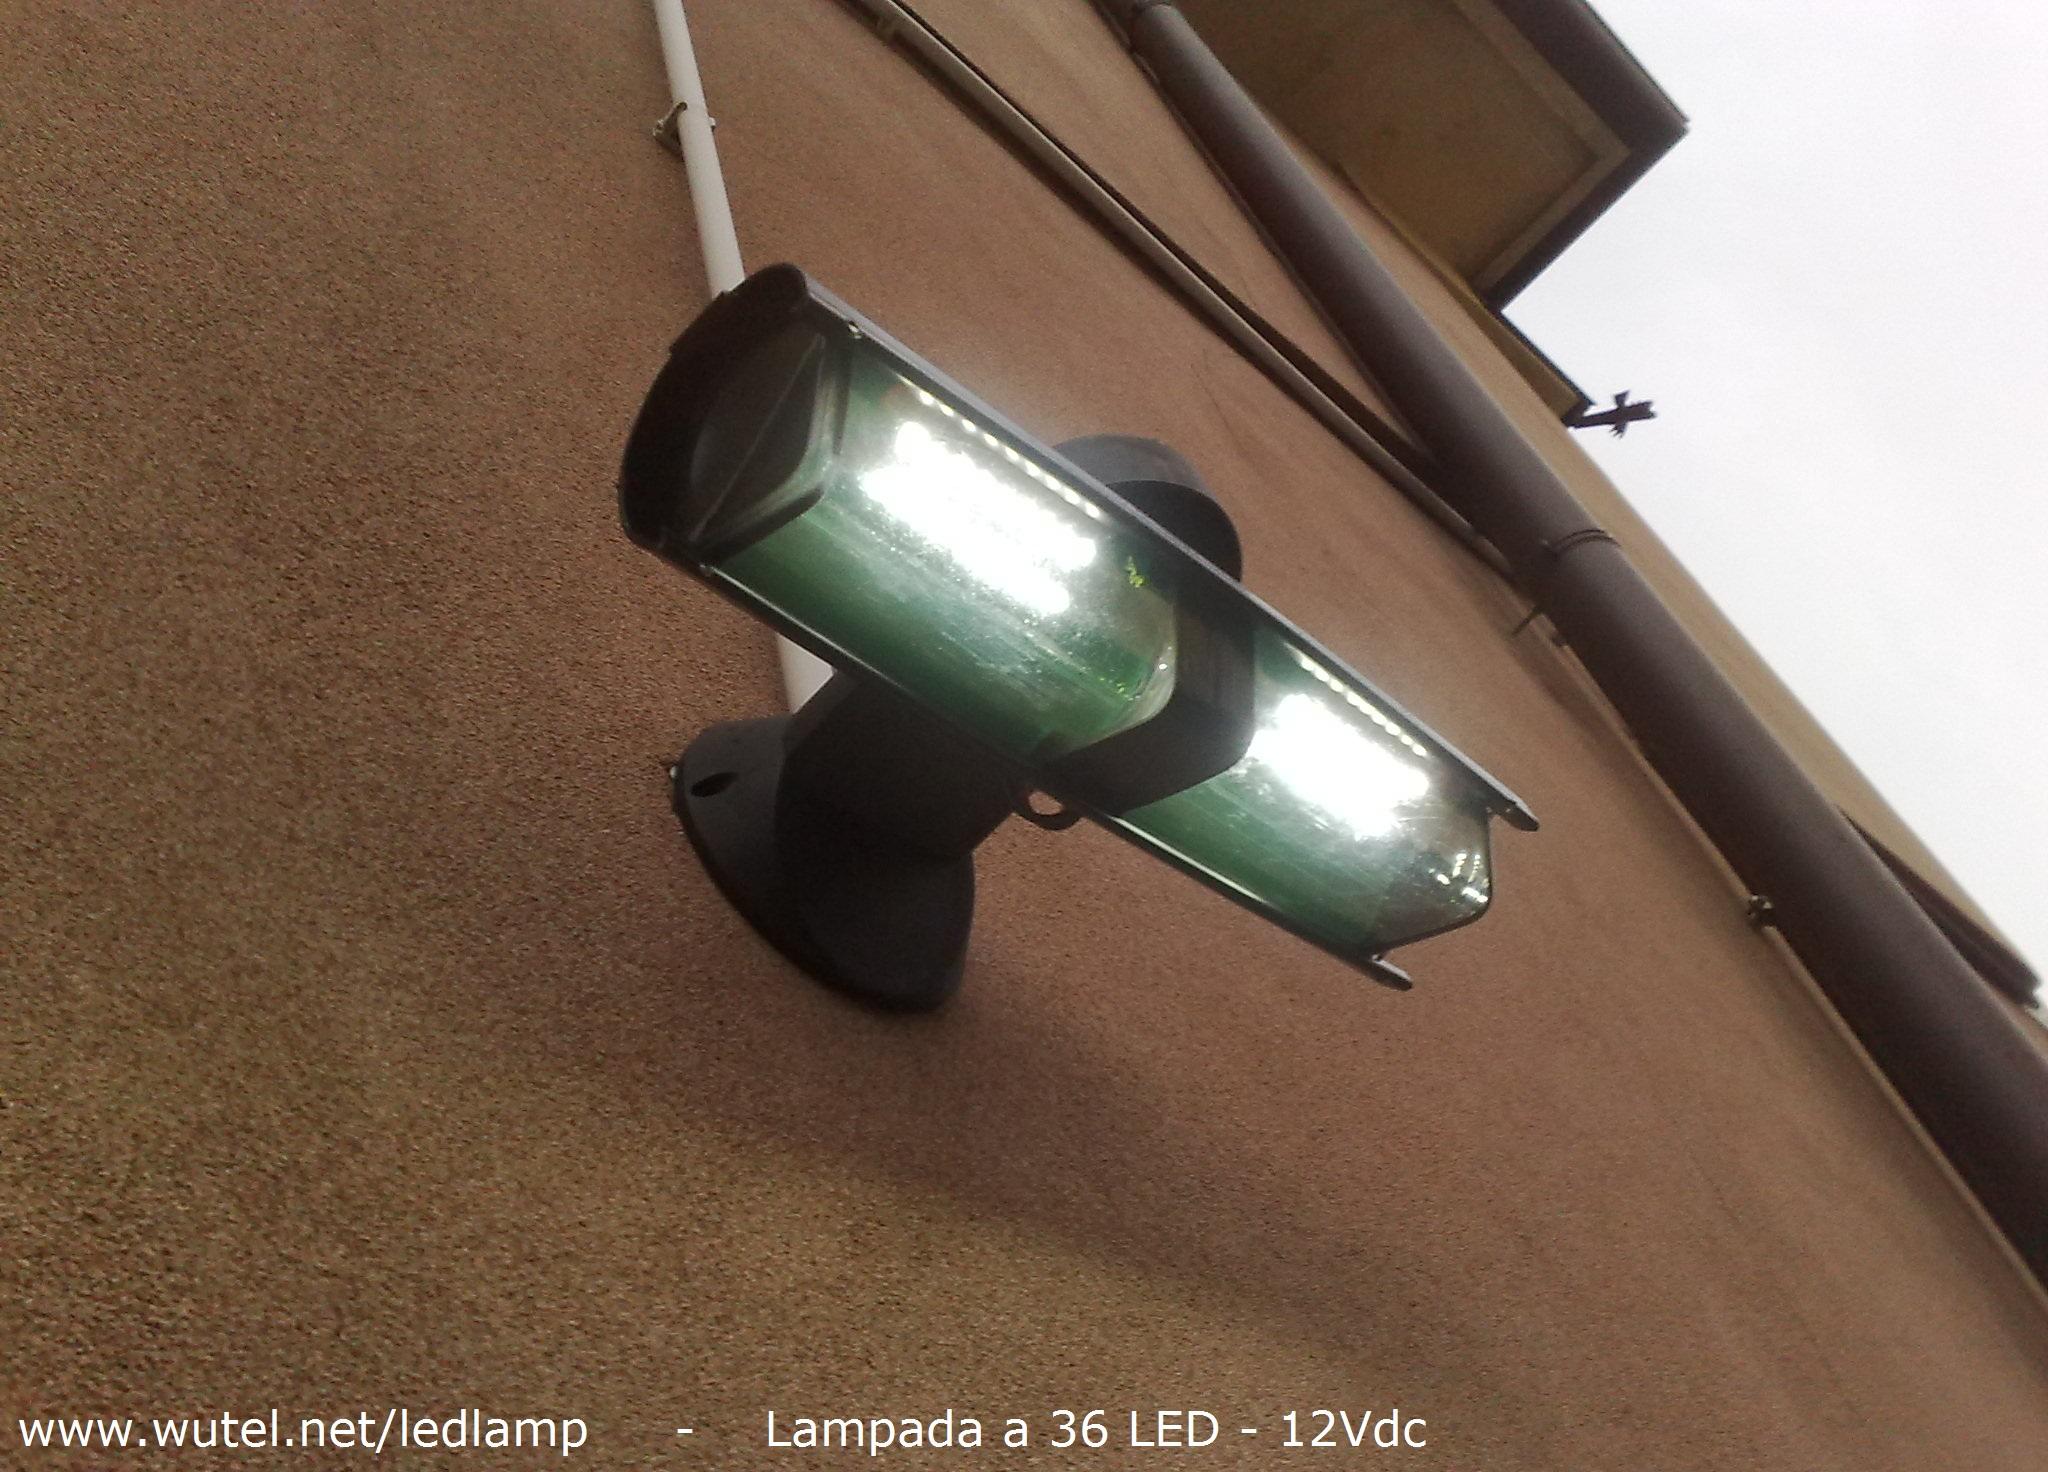 - Lampade a led per casa prezzi ...